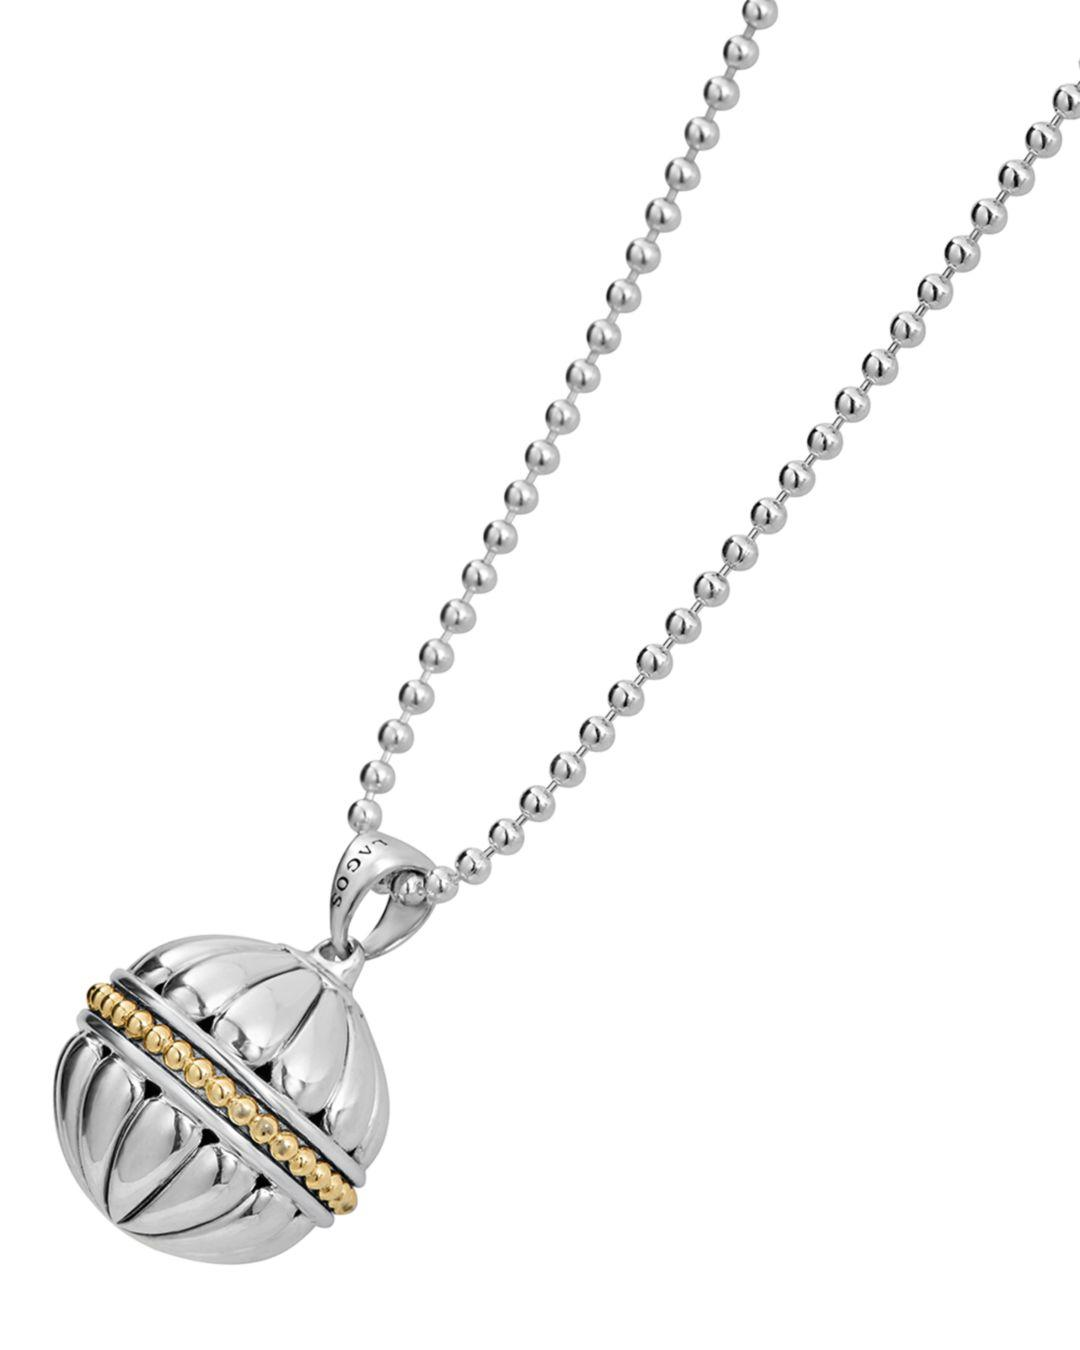 Lagos 18k Gold & Sterling Silver Caviar Talisman Bead Pendant Necklace in Gold/Silver (Metallic)